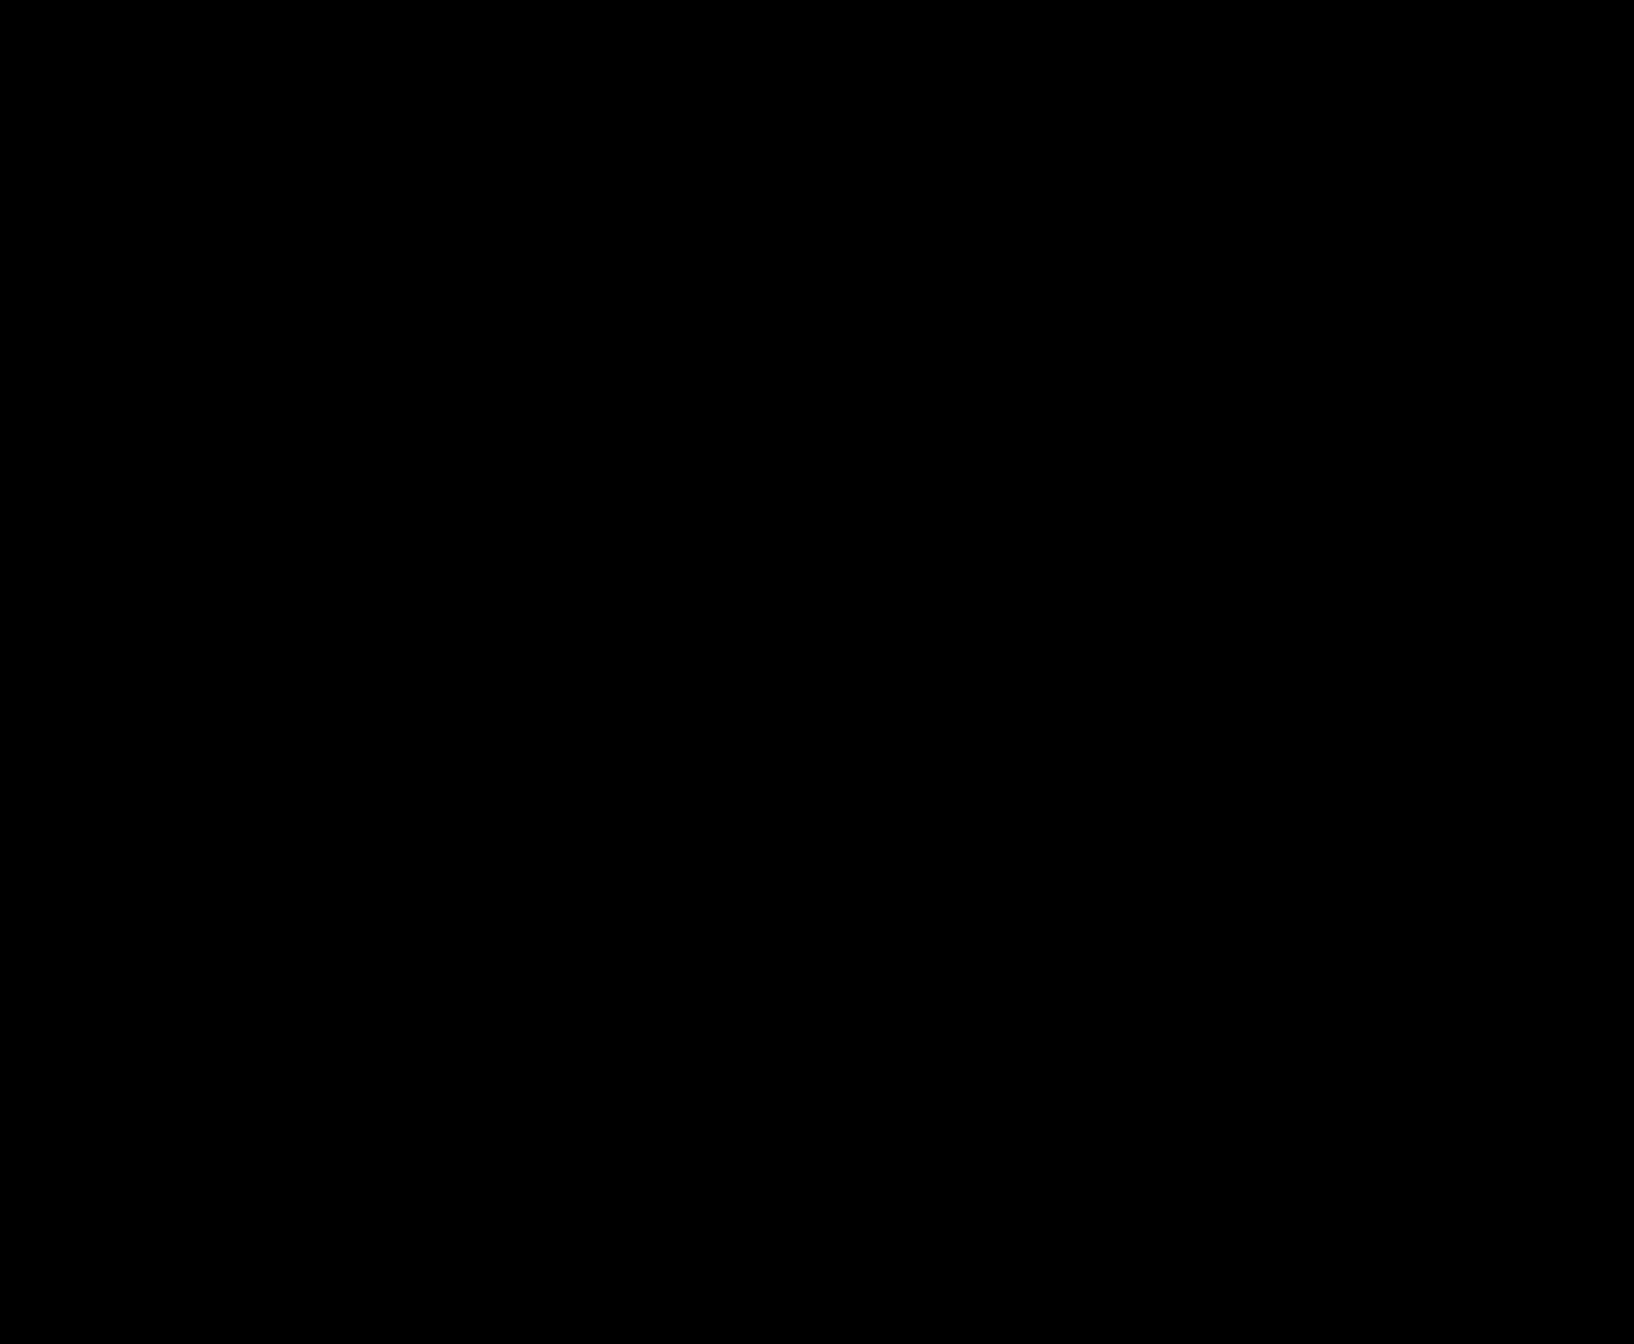 atomos-logo-vertical-black-1.png